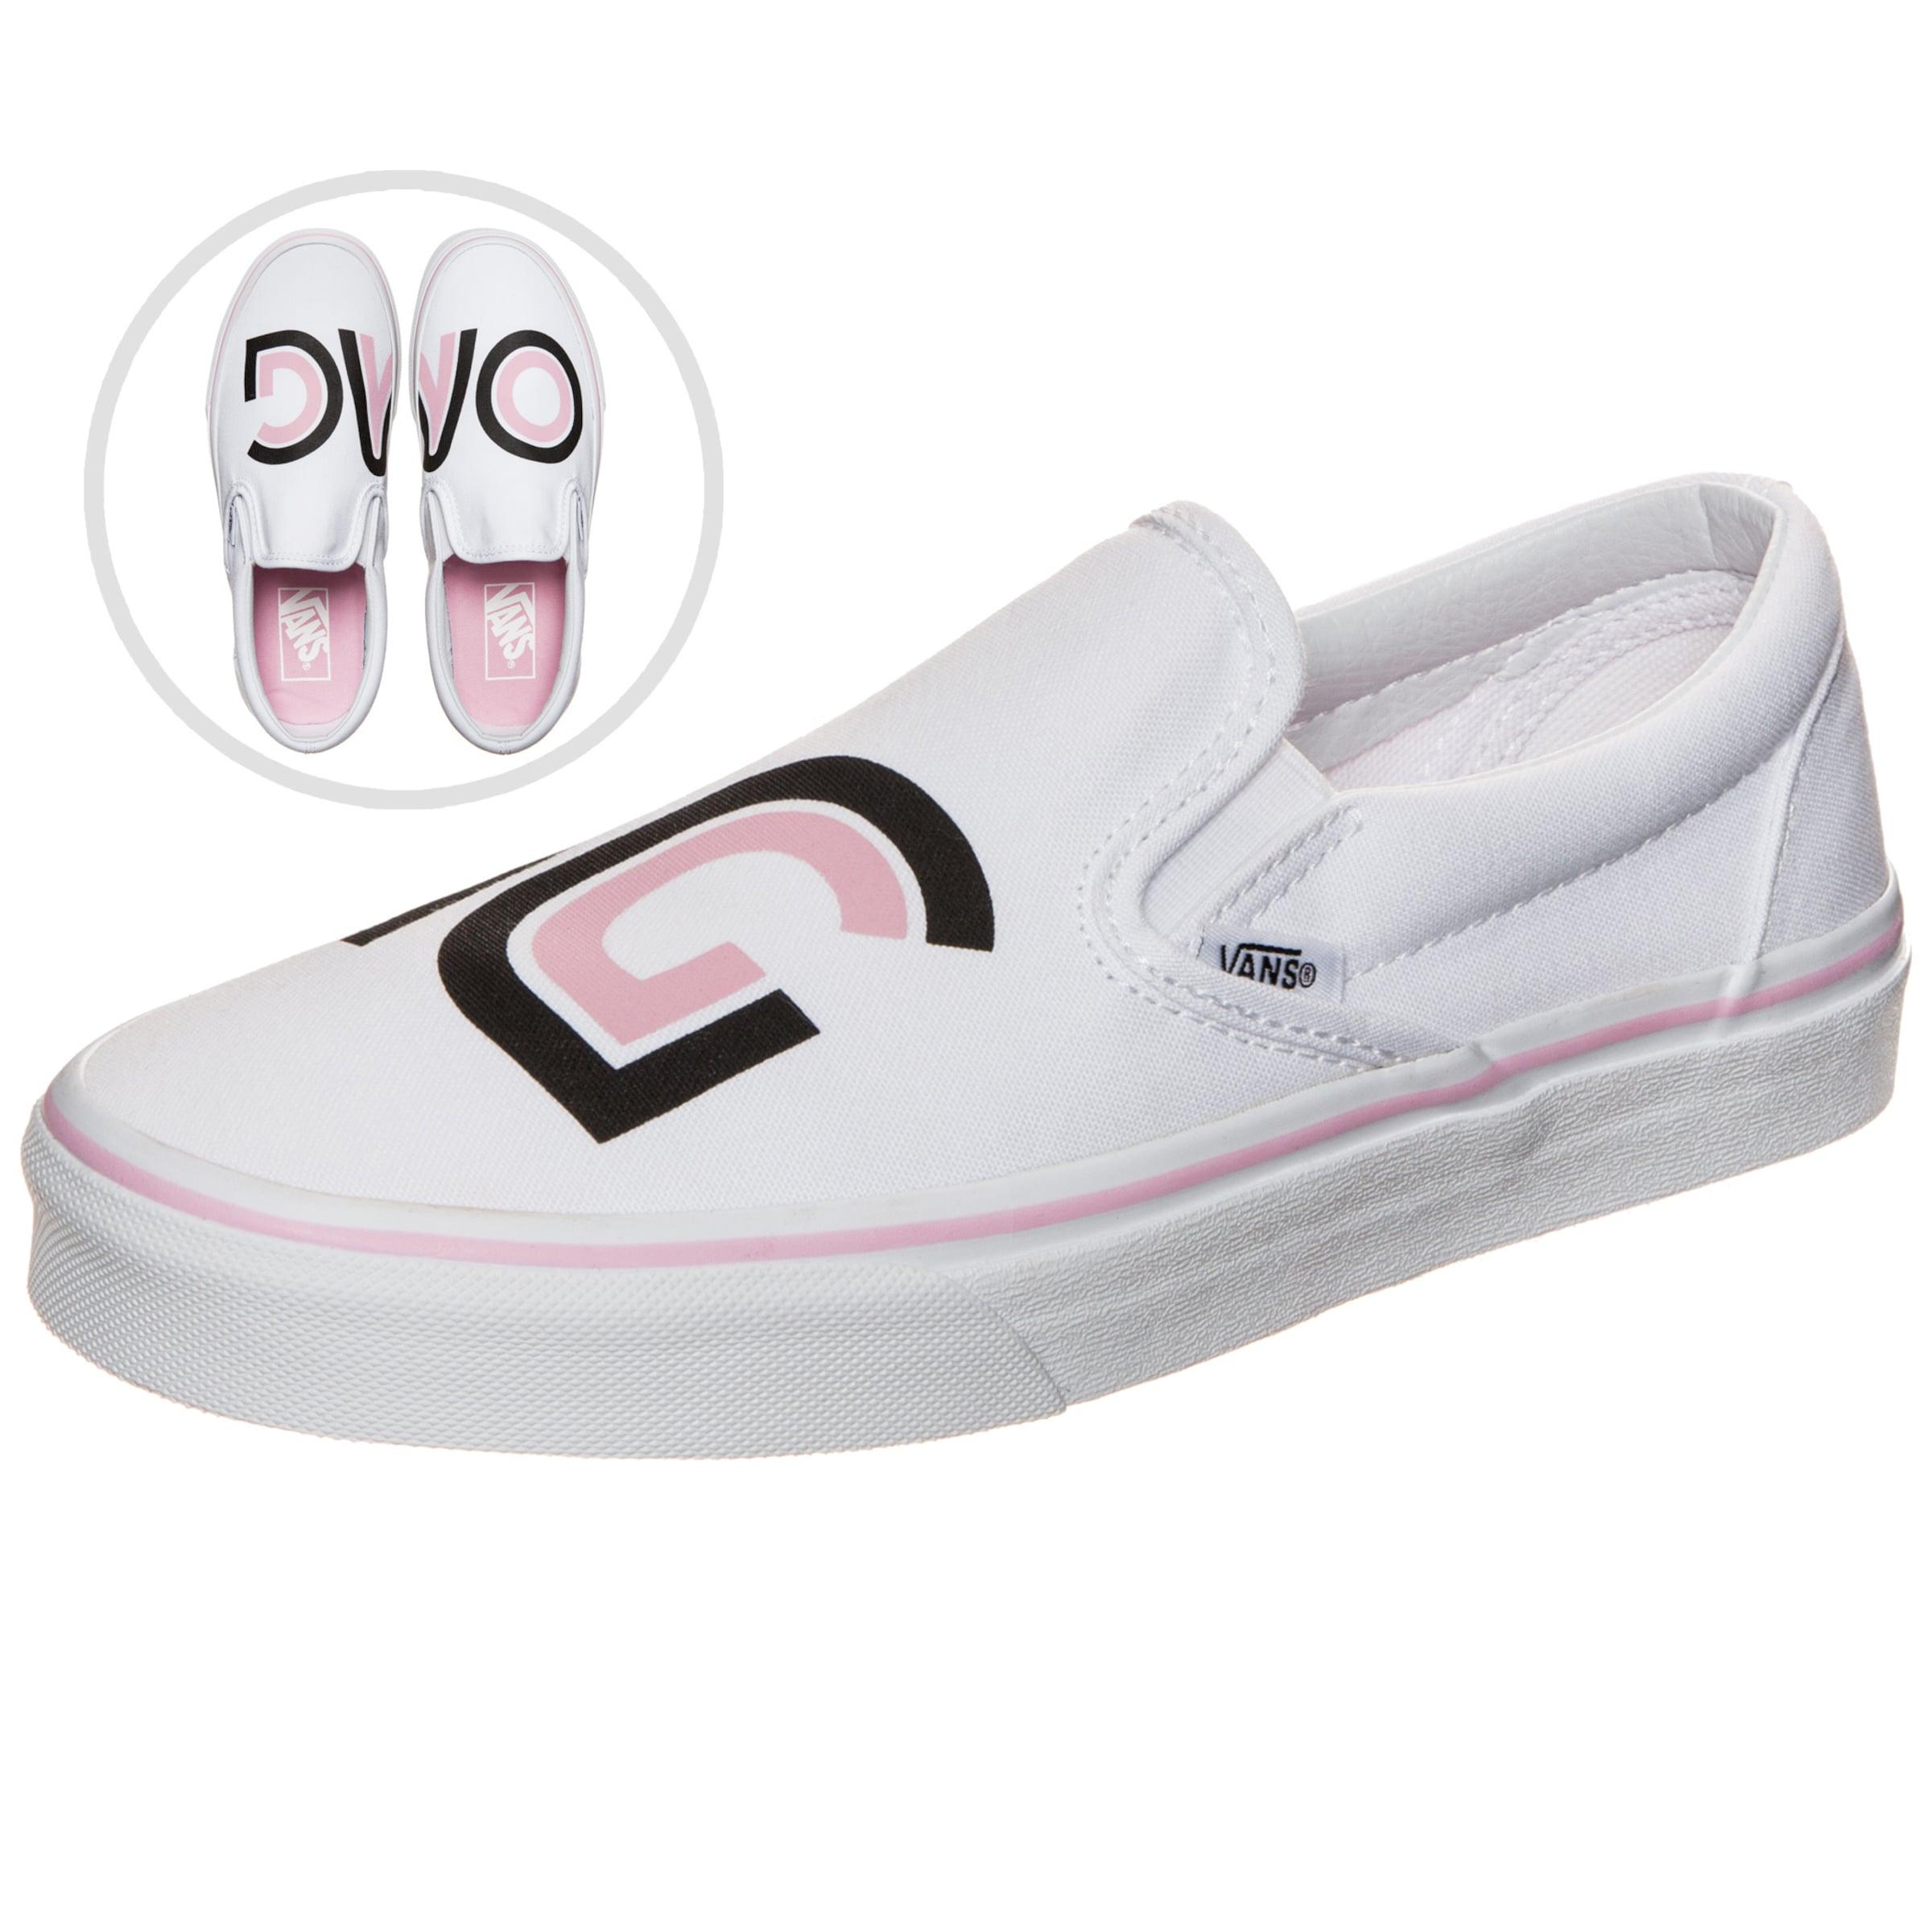 Um Zu Verkaufen VANS Classic Slip-On Sayings Sneaker Damen Outlet-Store Rabatt Großhandel Erschwinglicher Verkauf Online H128oxGevt